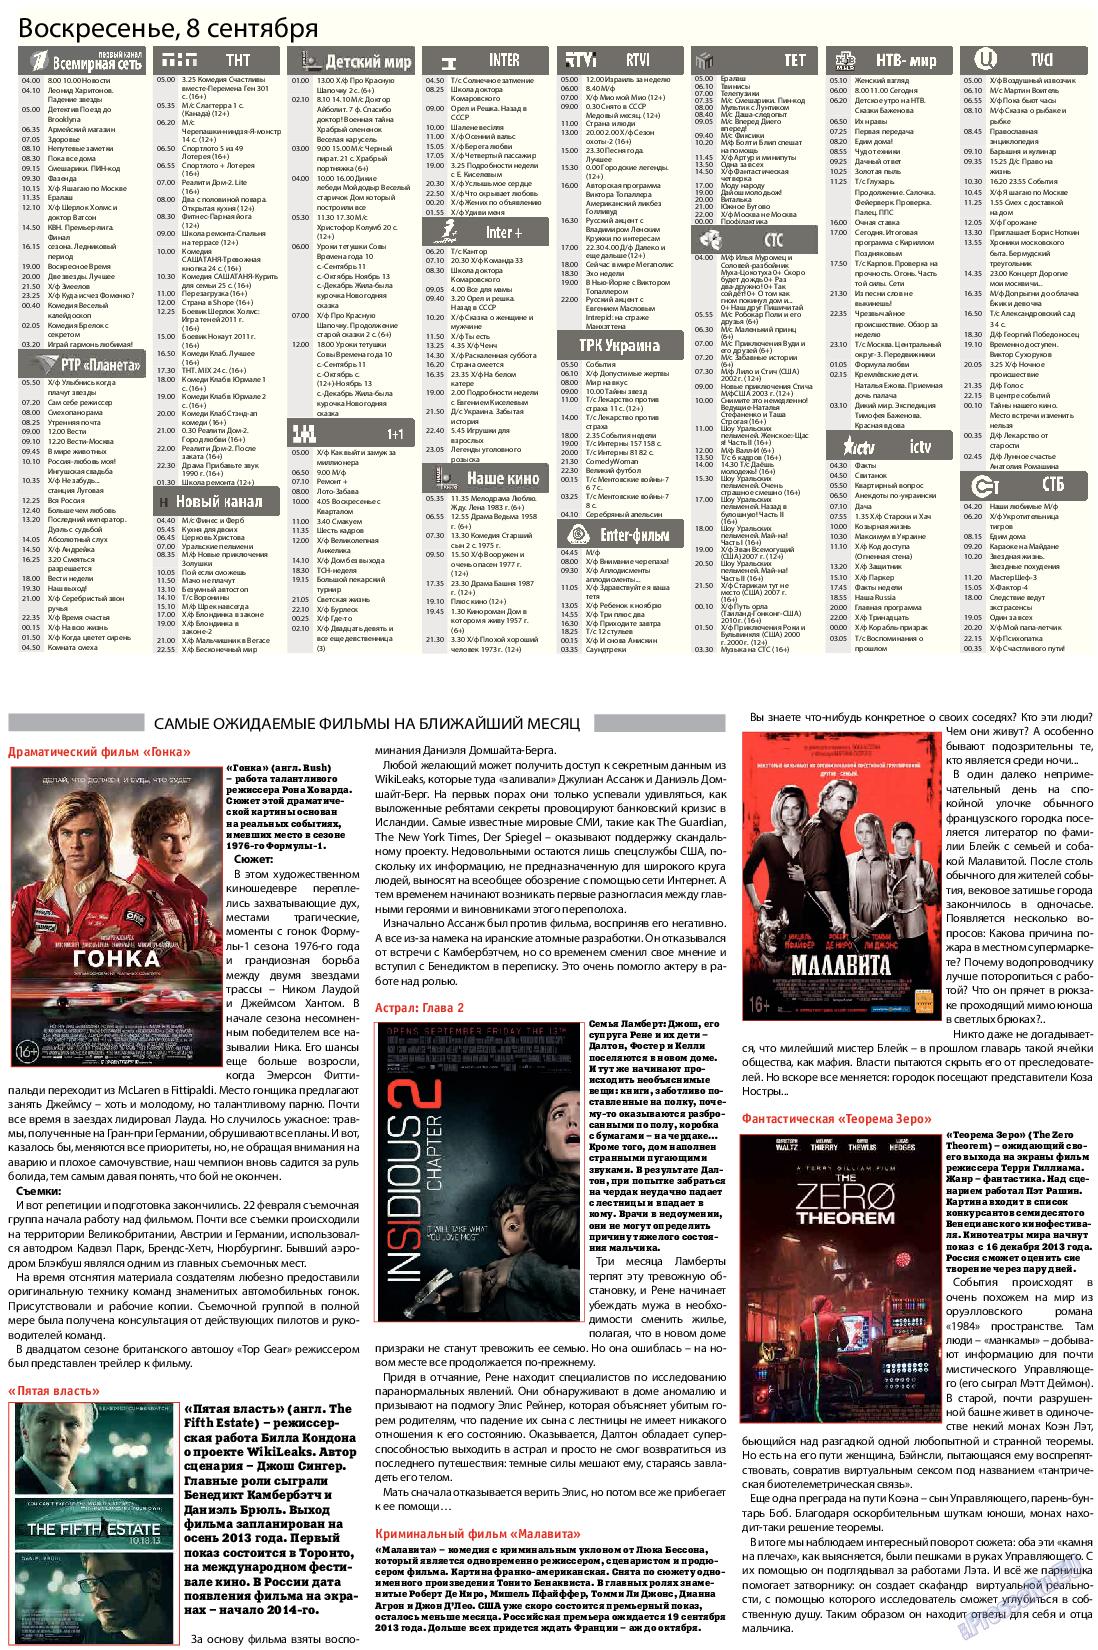 Новая Wолна (газета). 2013 год, номер 35, стр. 6